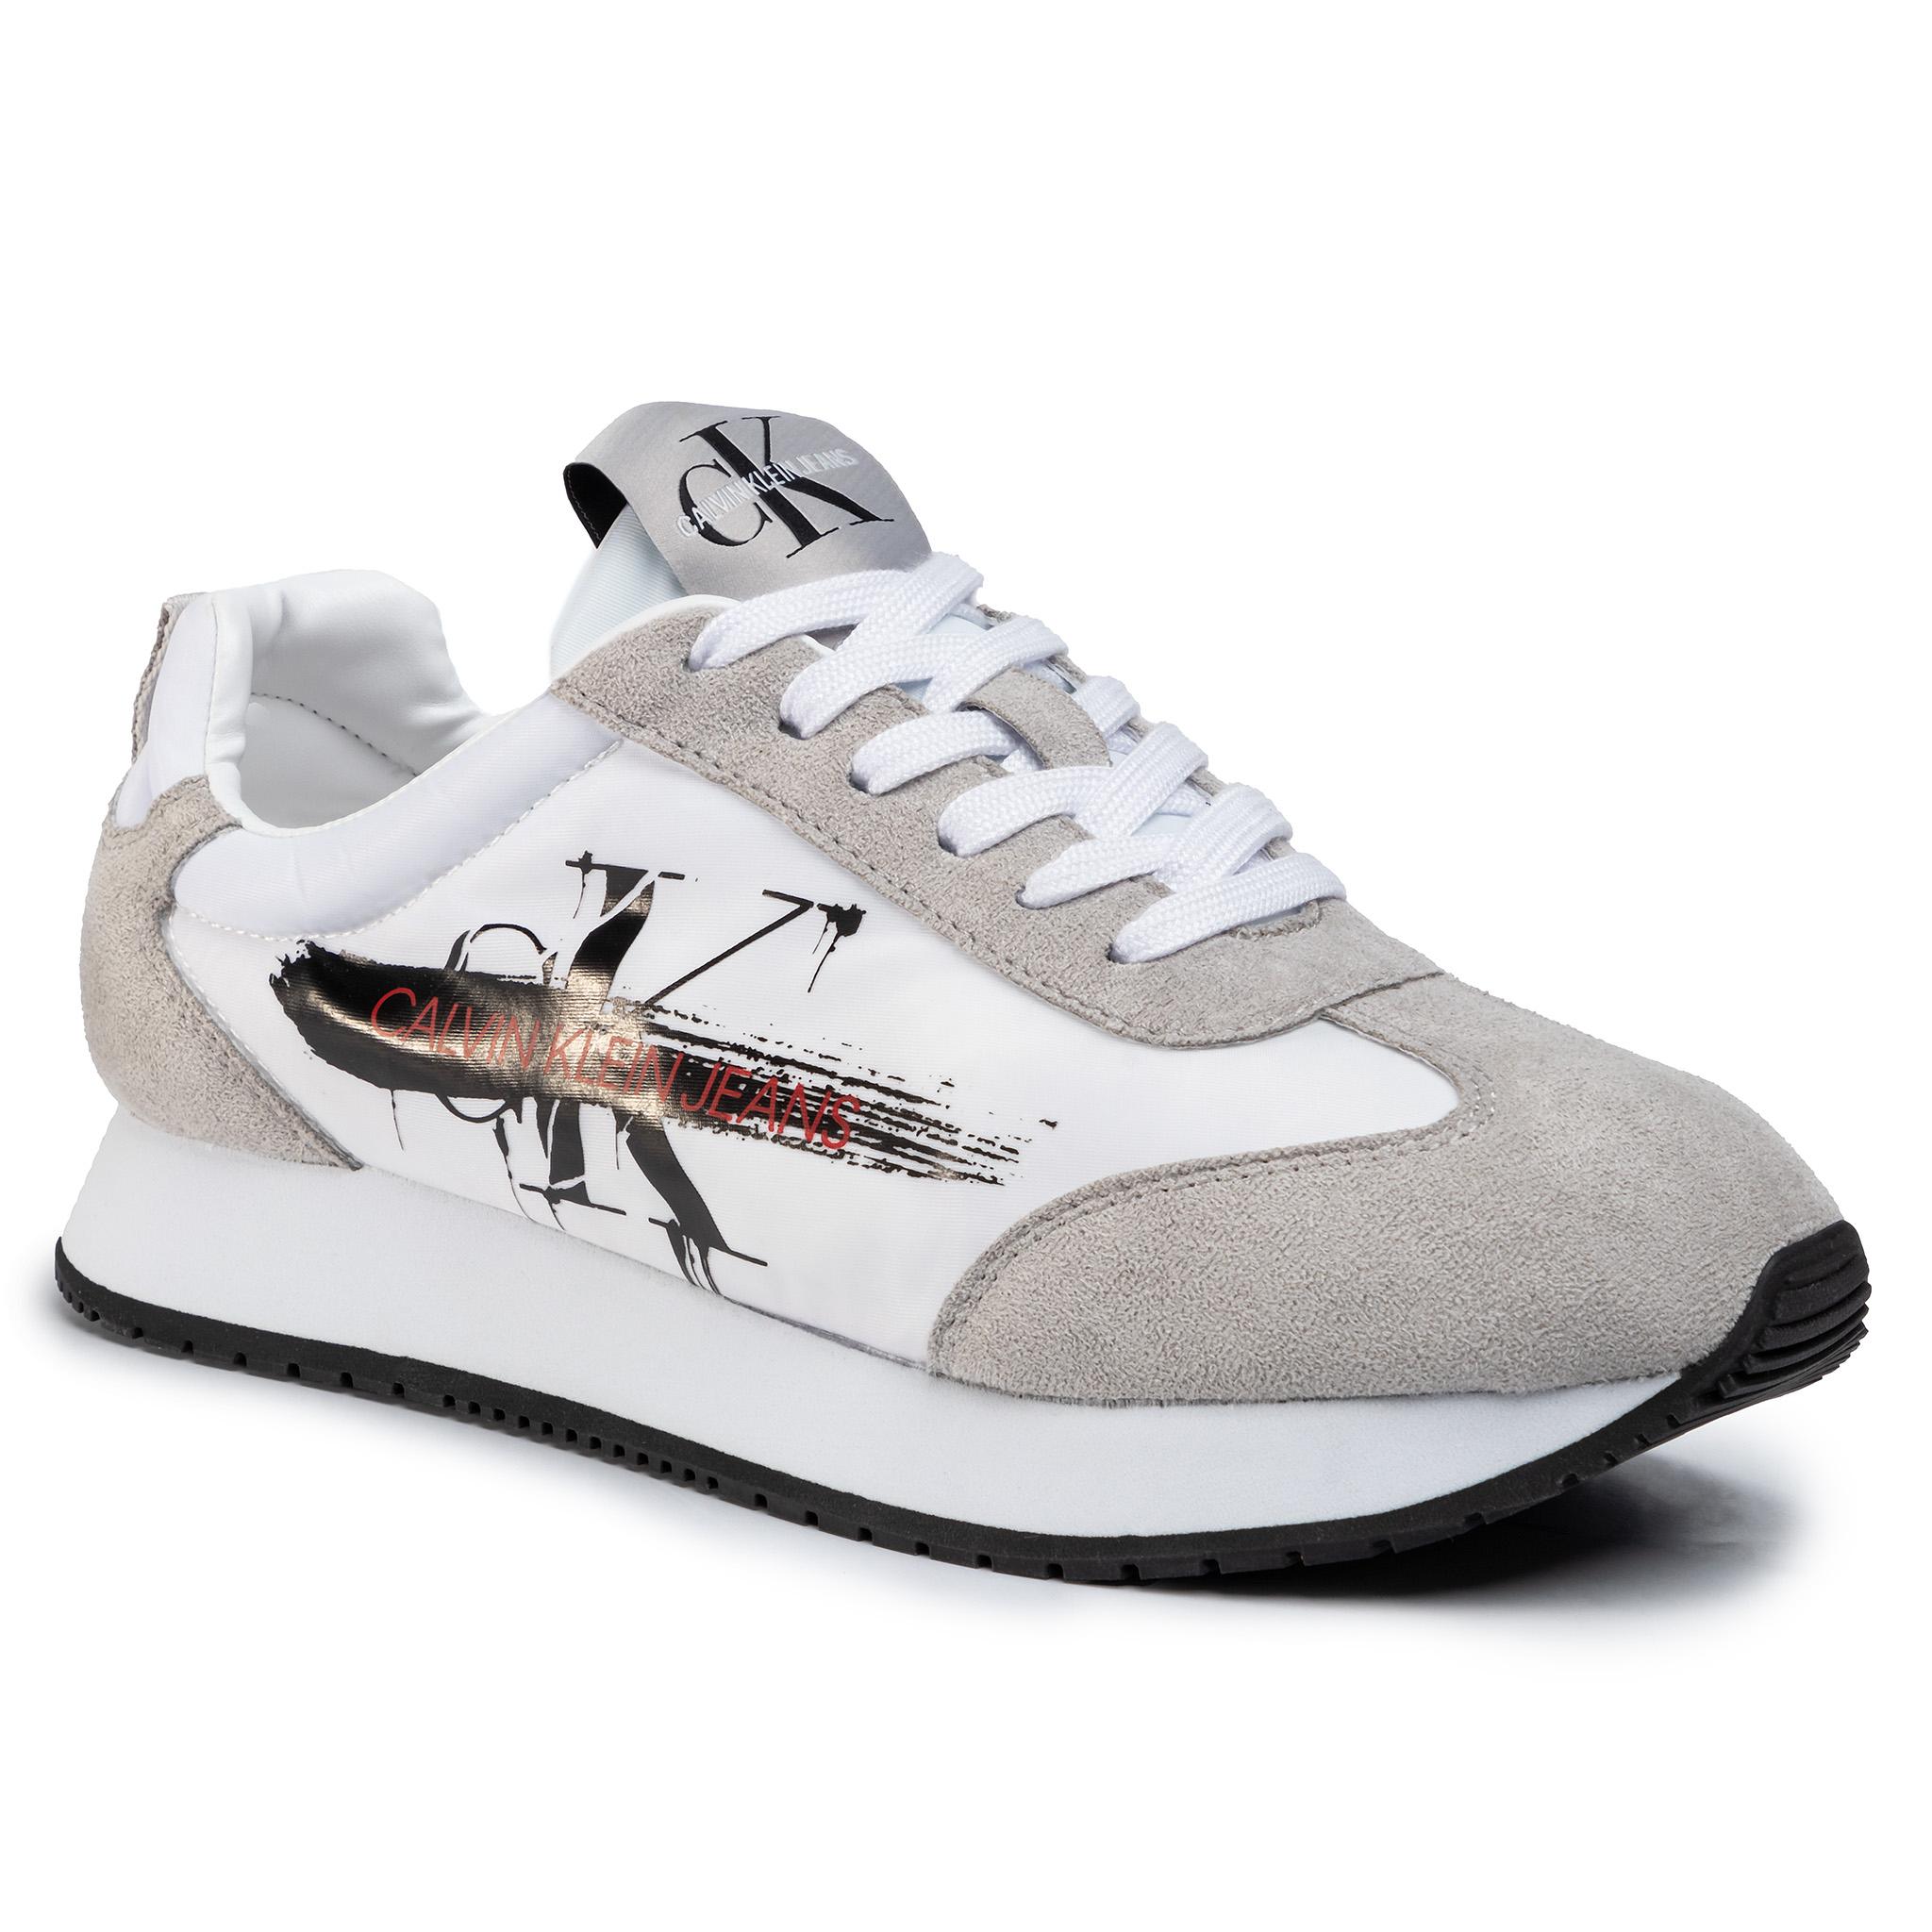 Image of Sneakers CALVIN KLEIN JEANS - Joam B4S0656 White